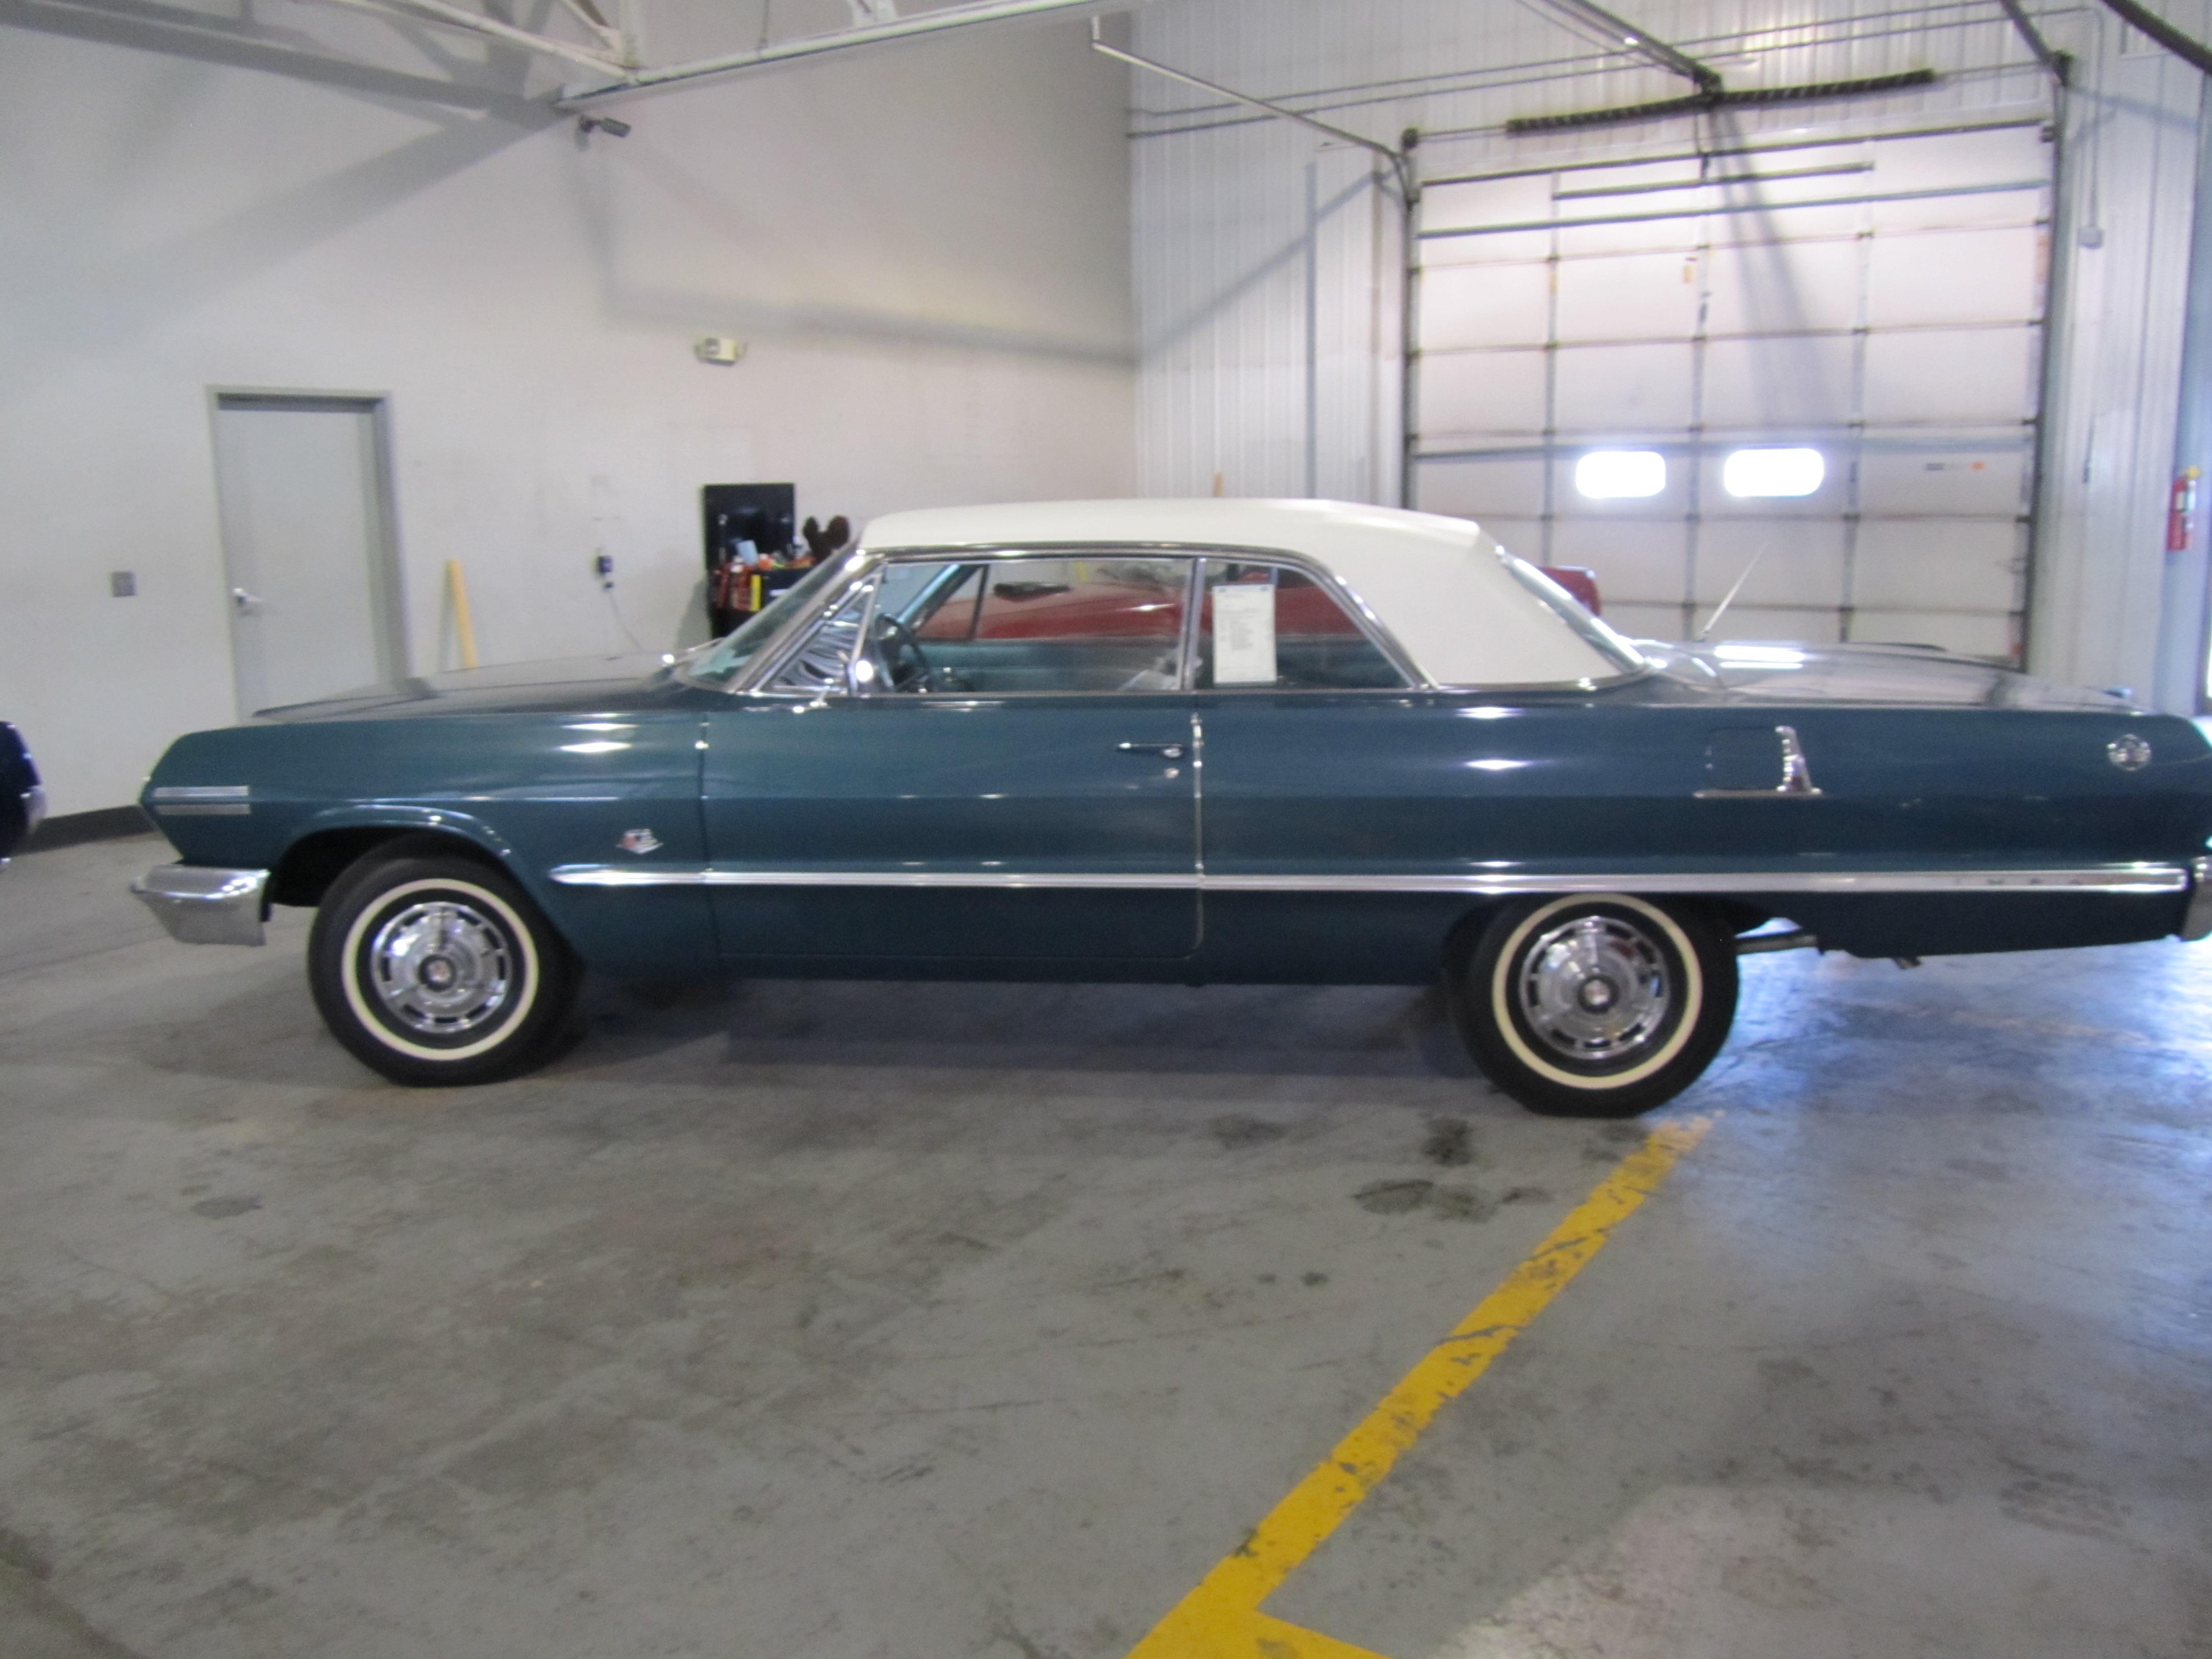 Chevy Impala 1963